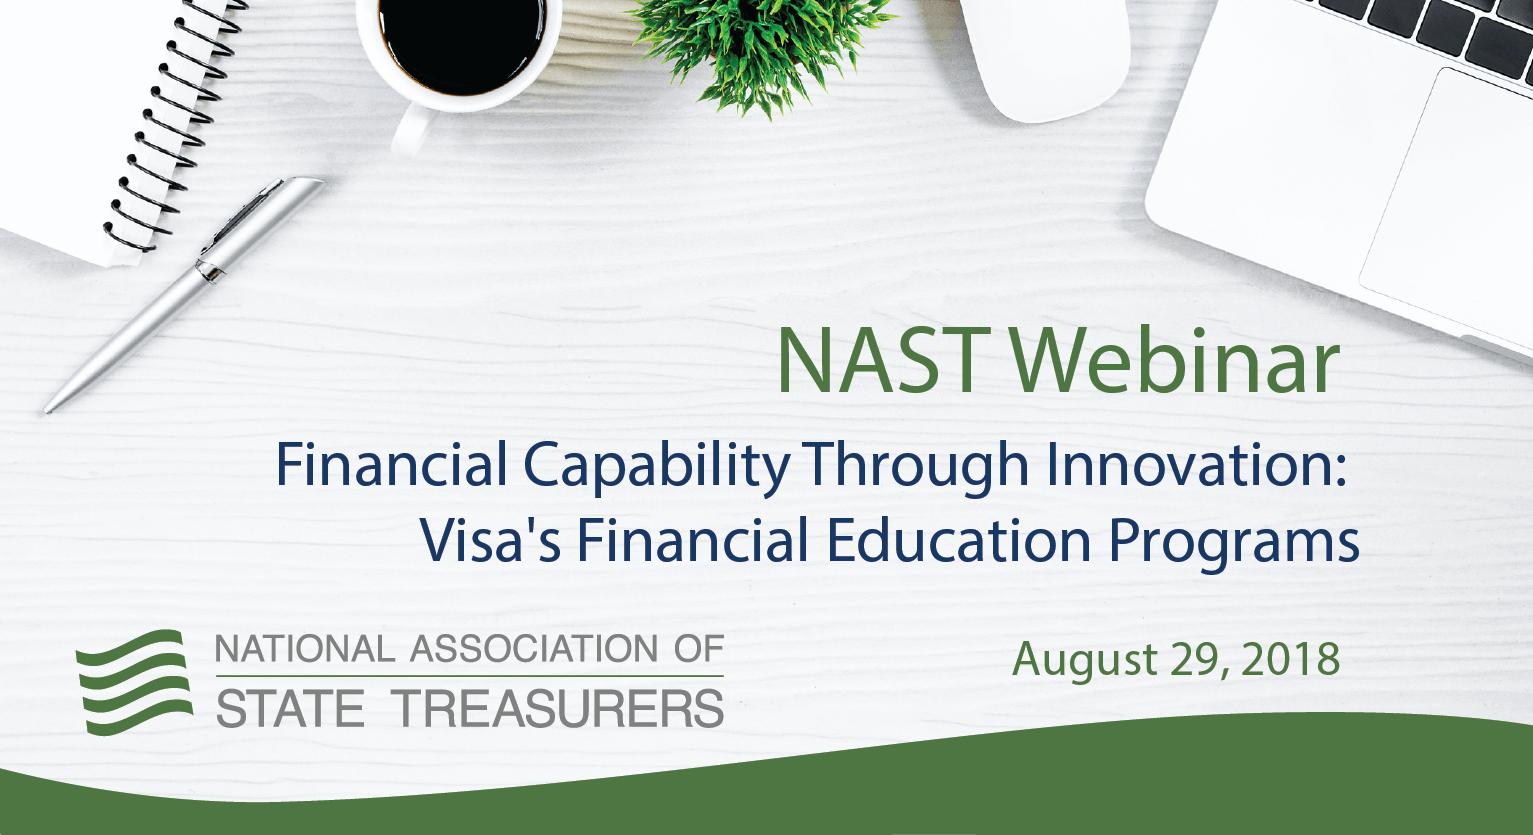 Financial Capability Through Innovation: Visa's Financial Education Programs